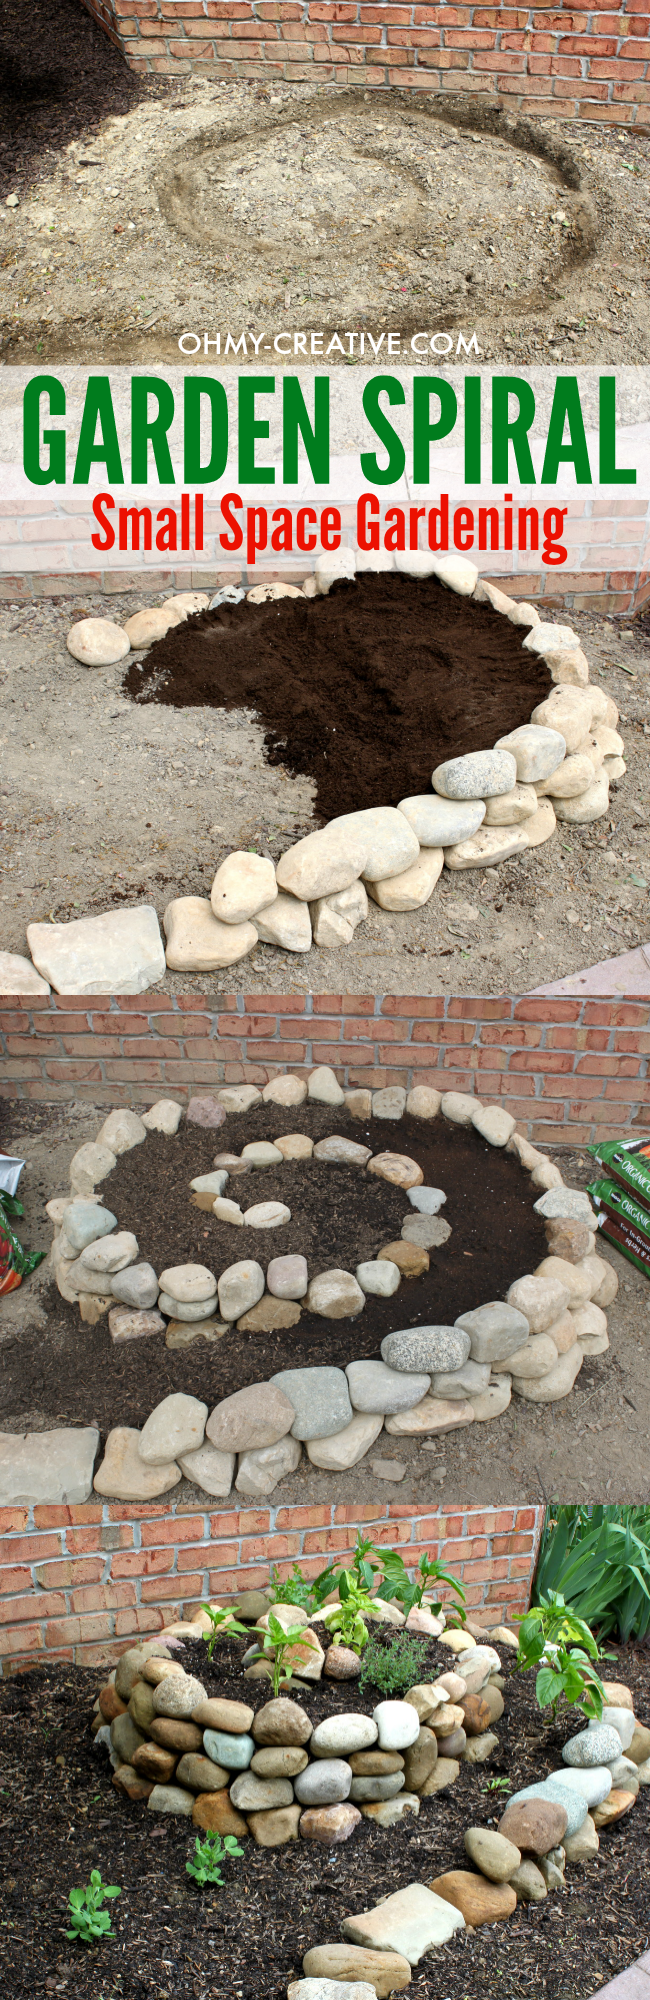 30 garden diy and craft ideas transforming your yard from for Corner vegetable garden ideas